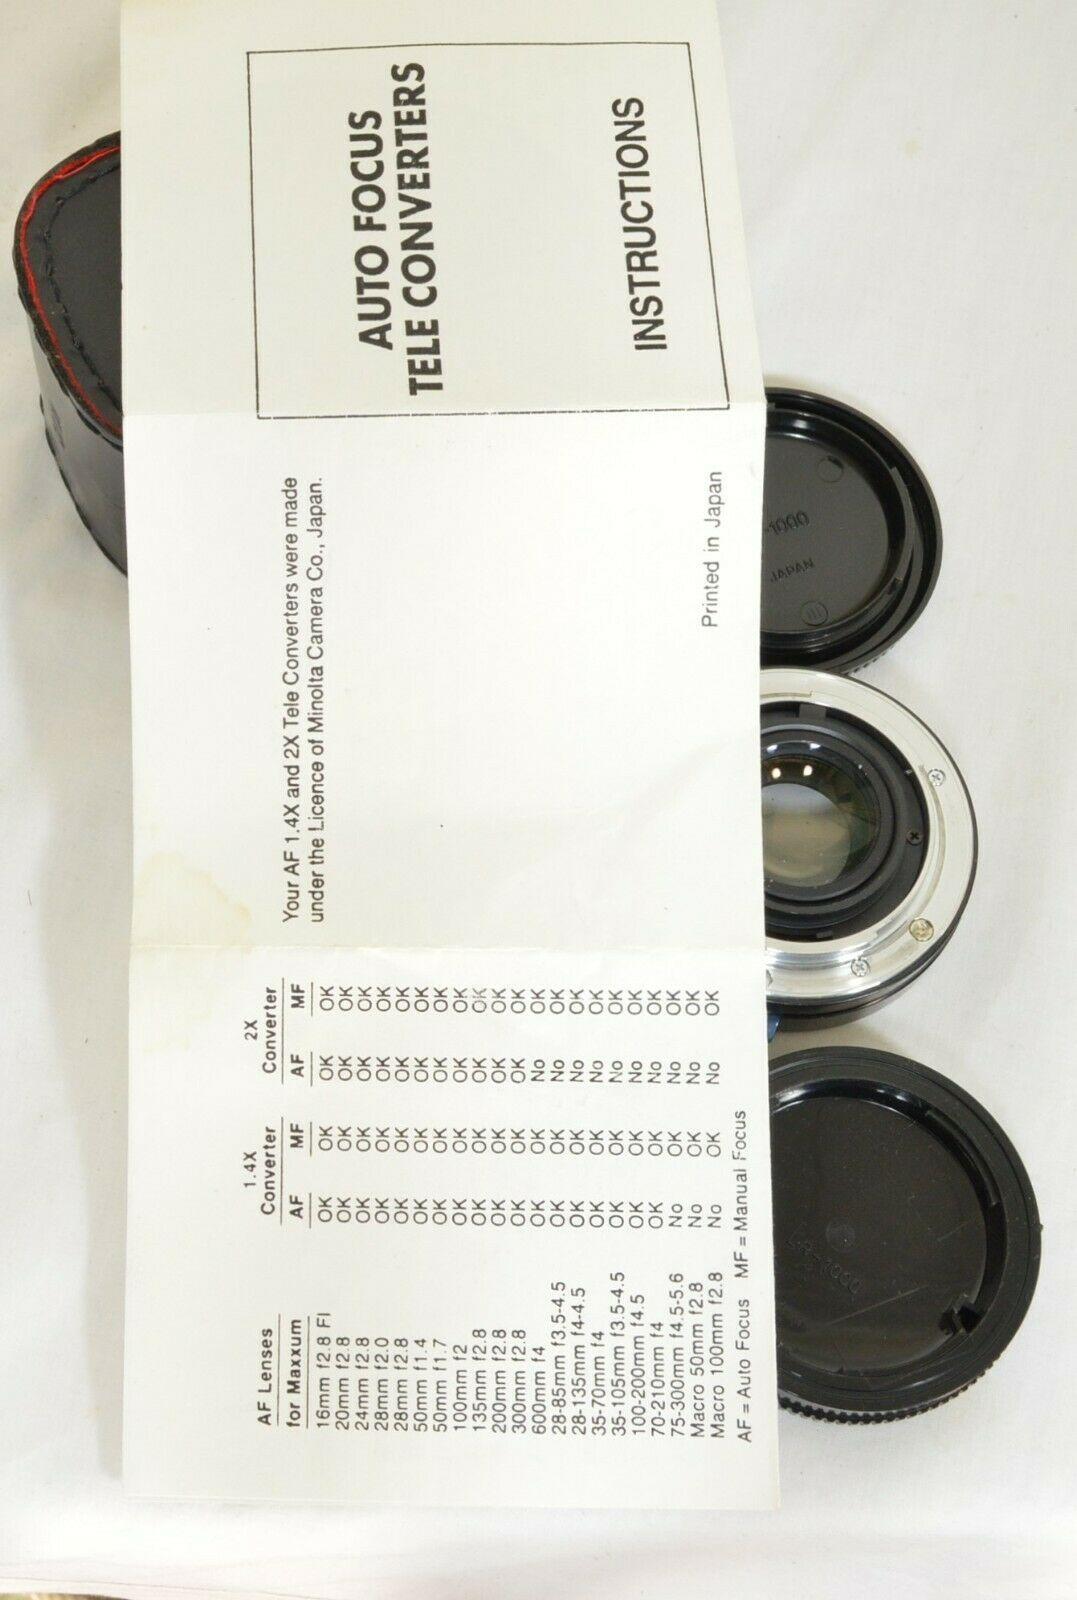 Kalimar 1.4 X M/AF Tele Converter Auto Focus camera lens w/ case & instructions image 9